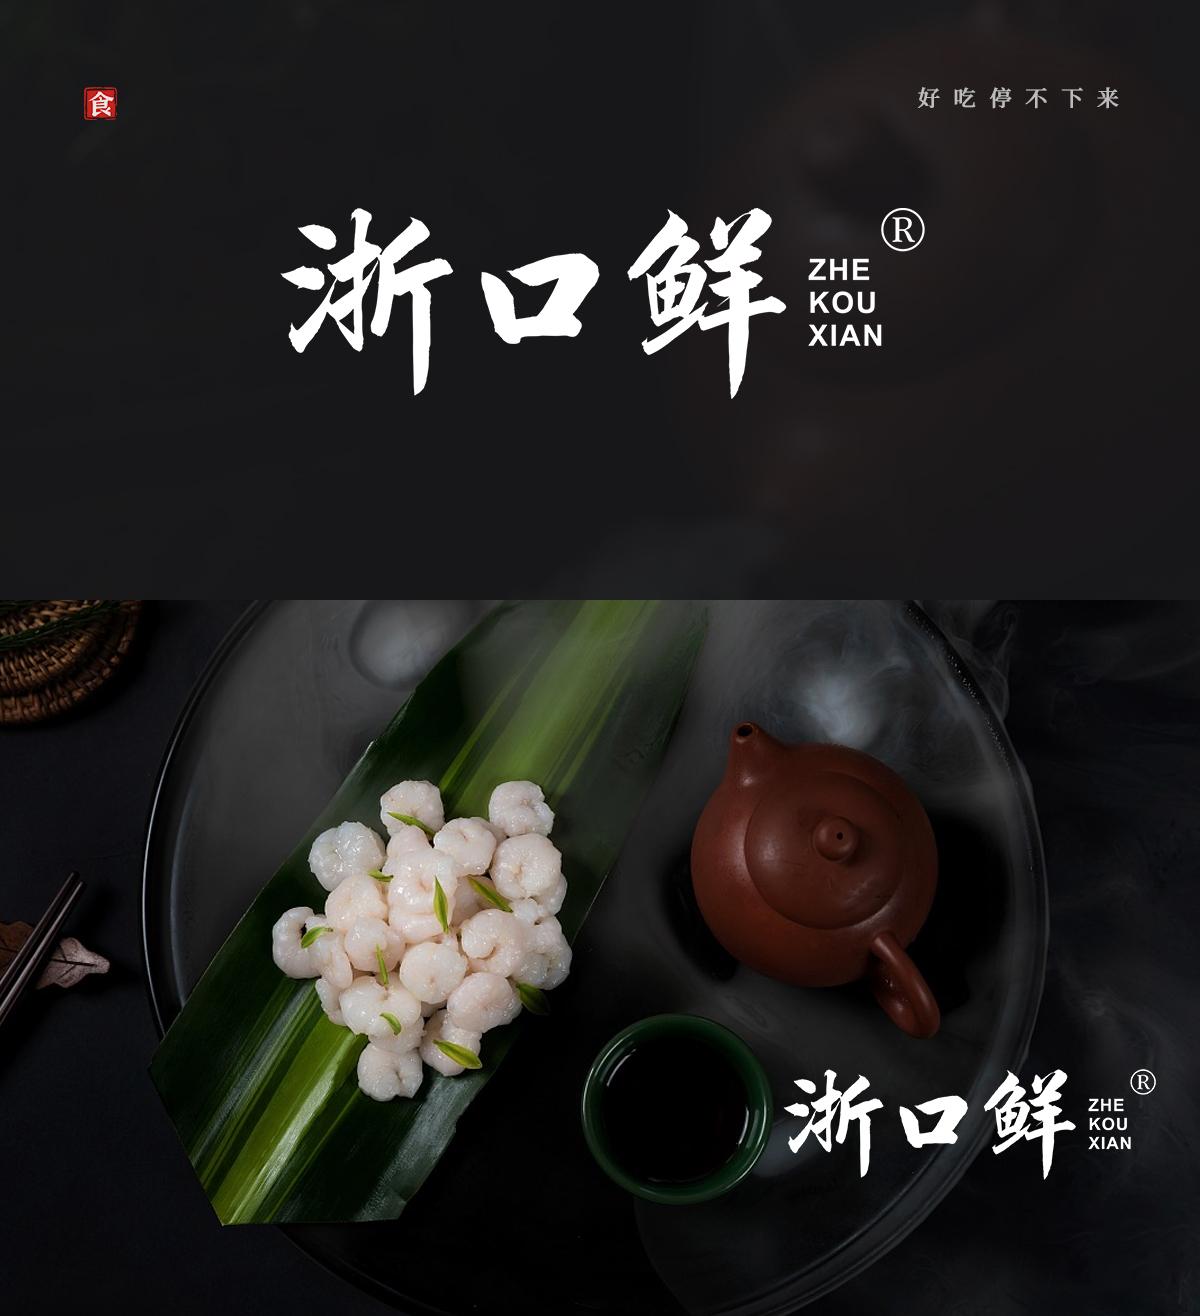 浙口鲜;ZHEKOUXIAN